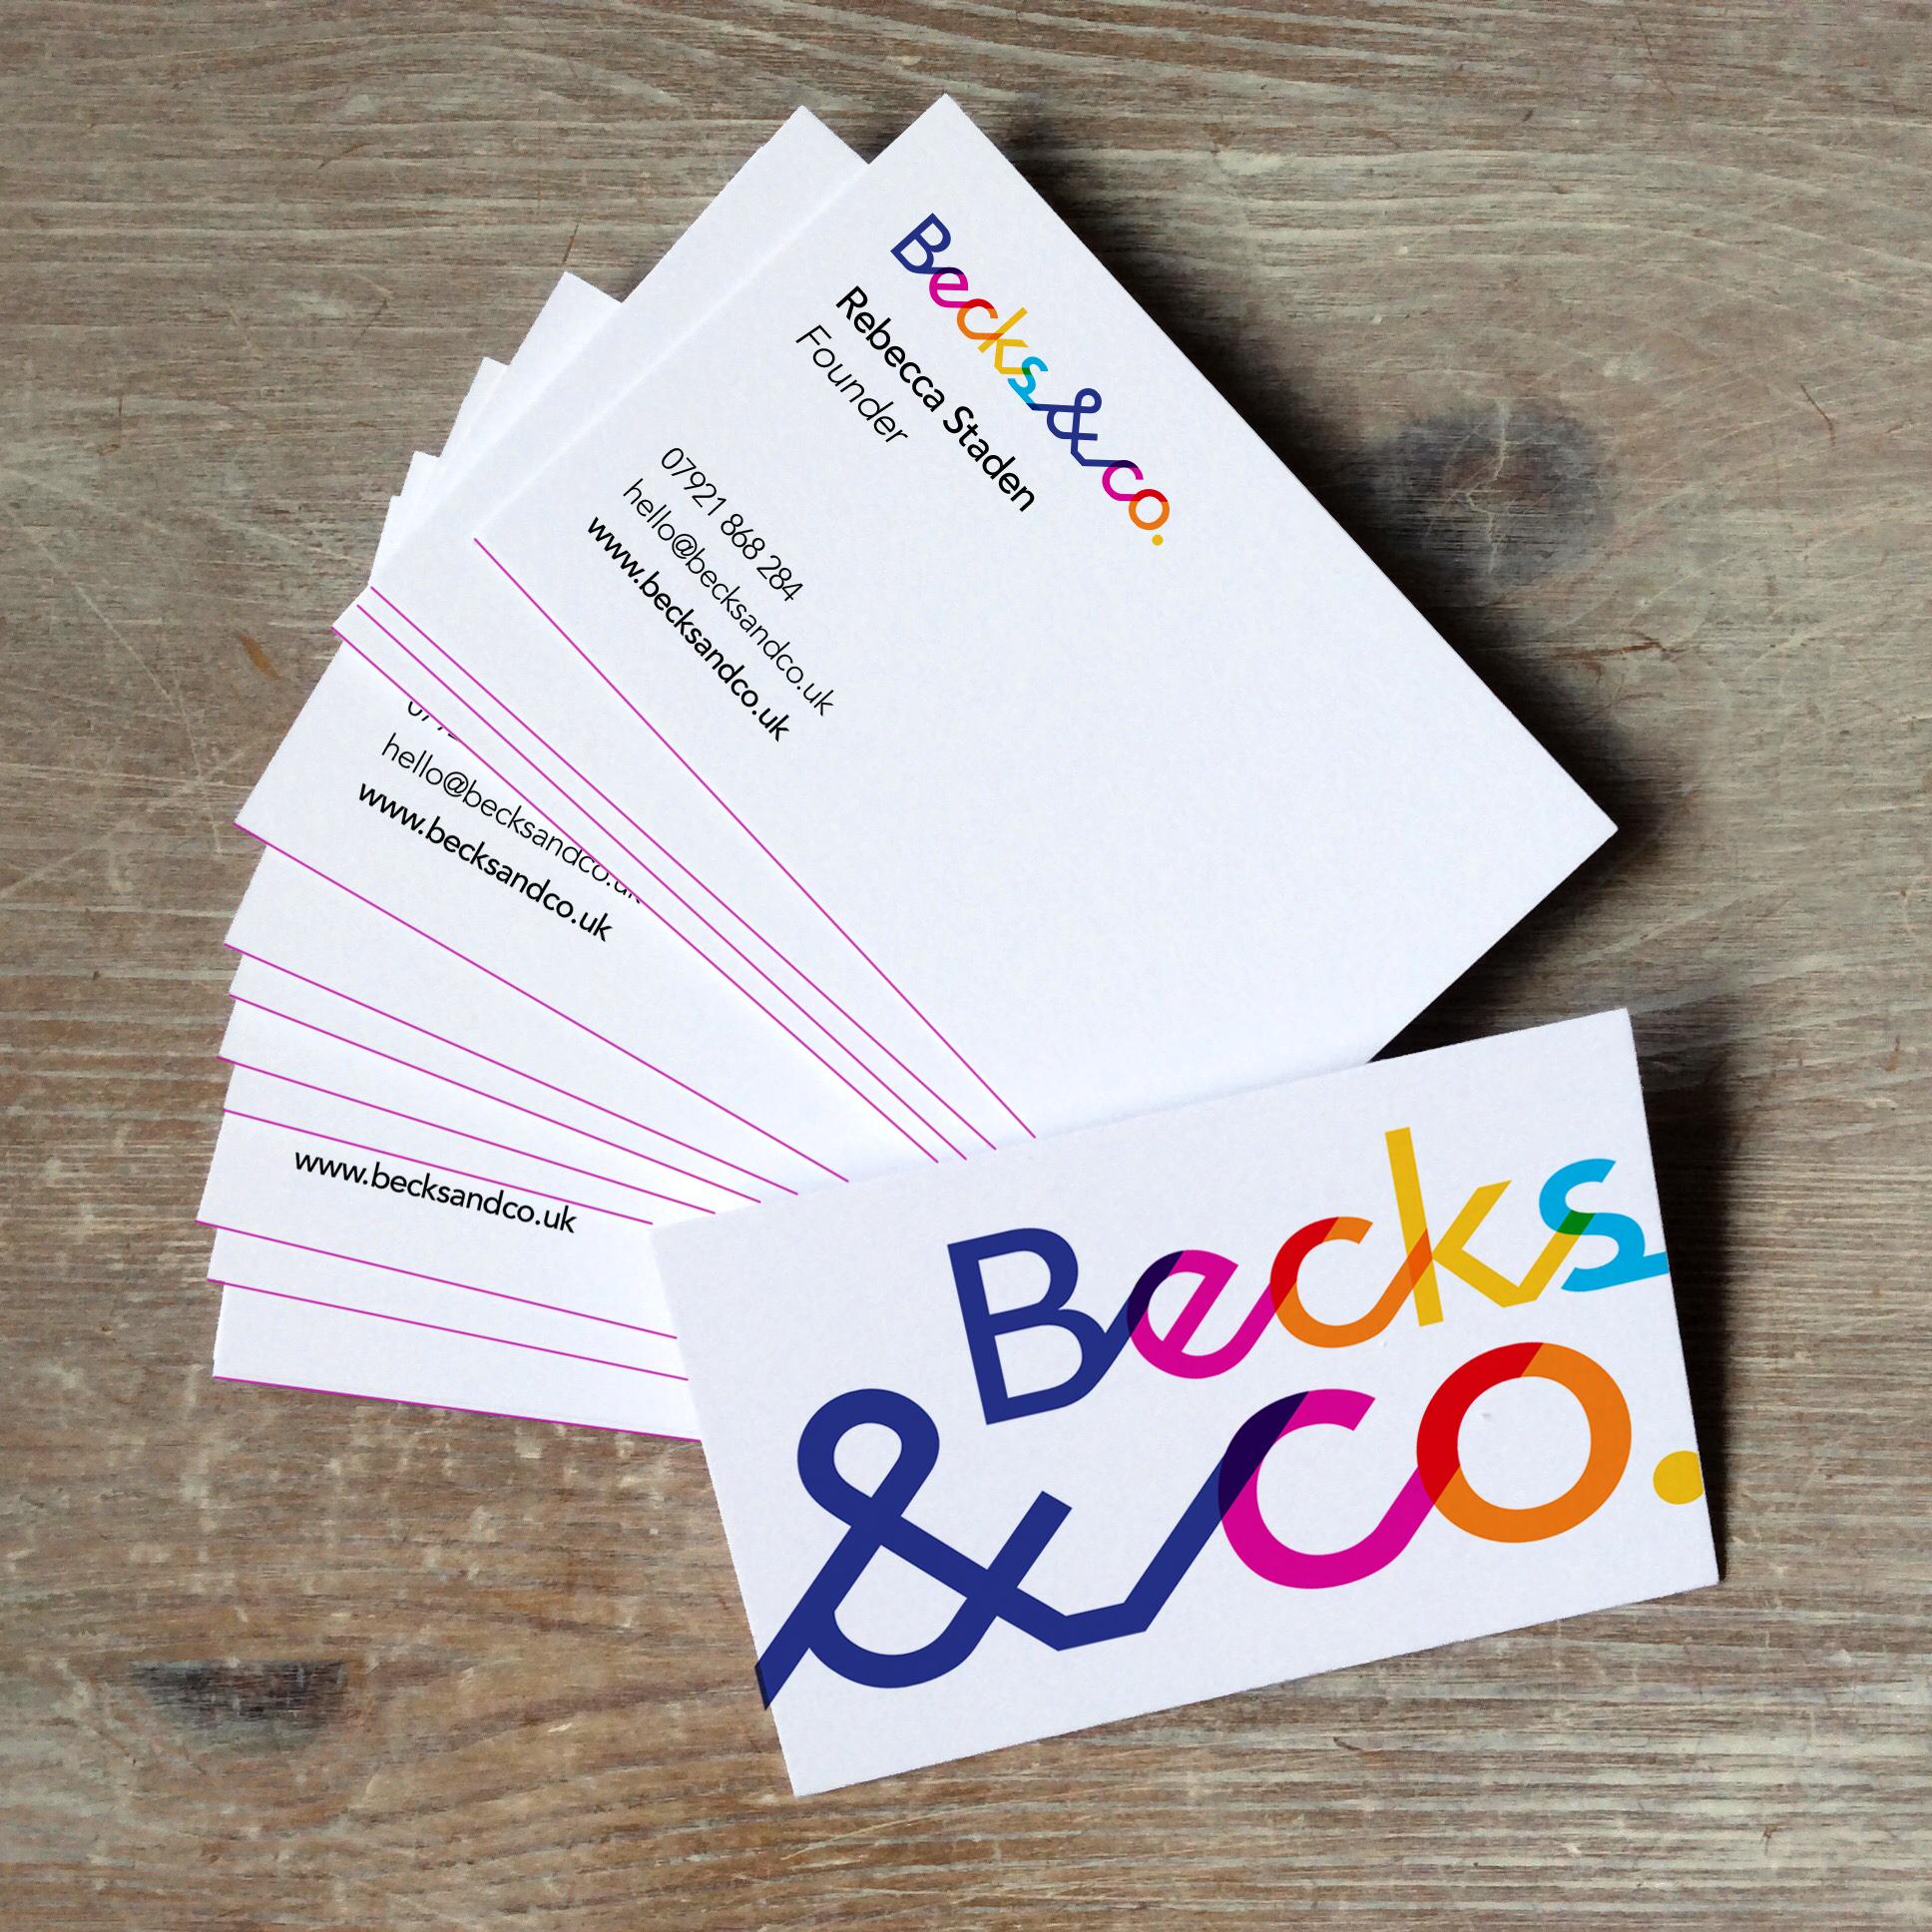 becks and co brand identity design